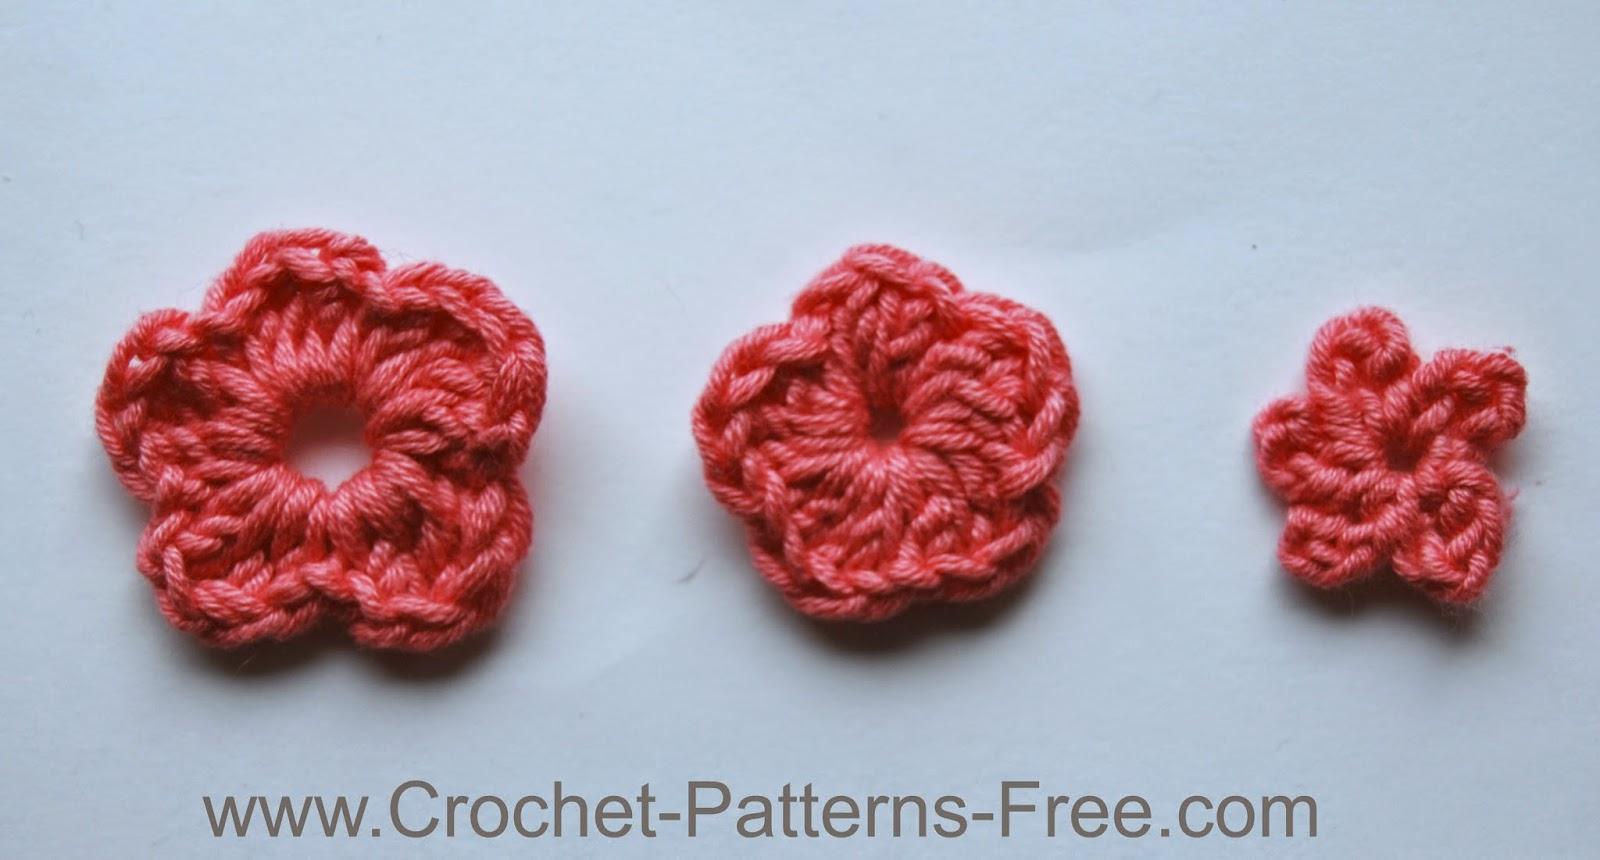 Small Crochet Flower Patterns Free Crochet Patterns free crochet flower patterns